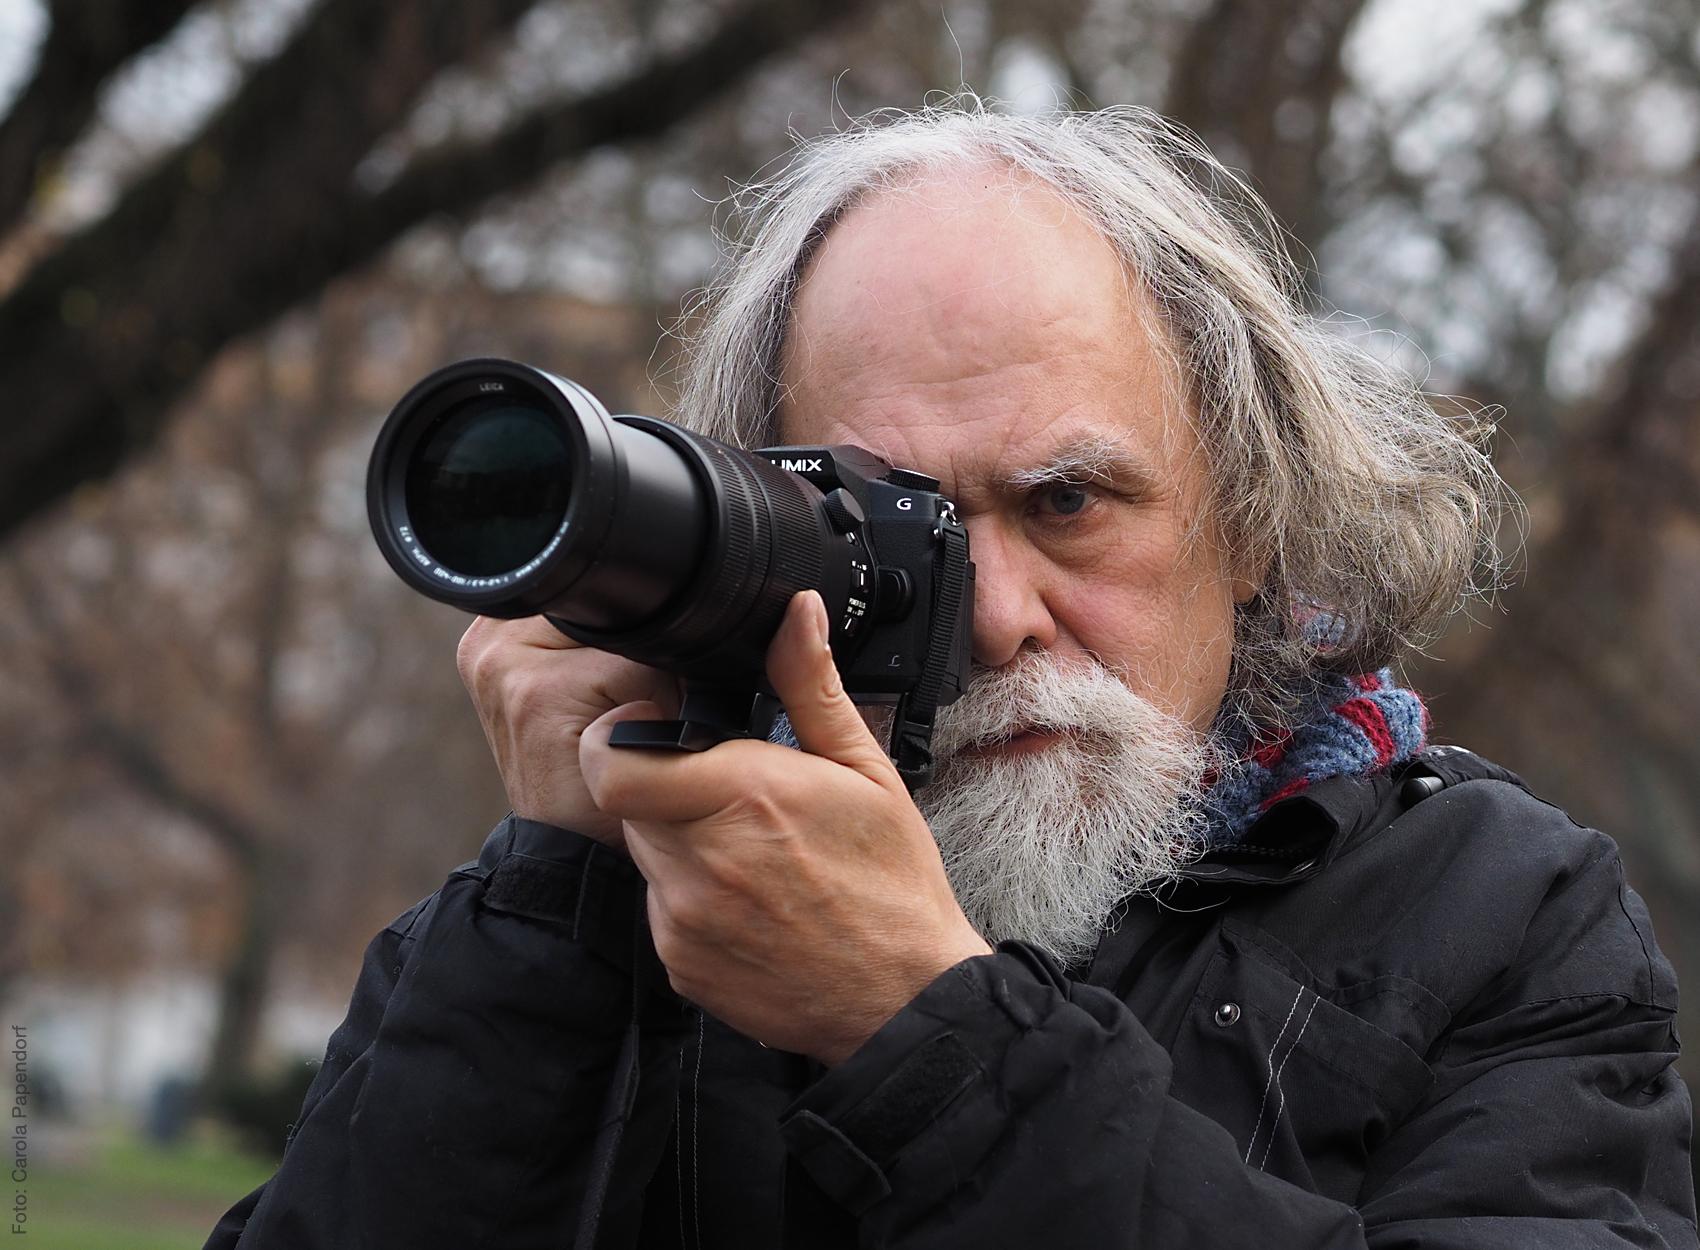 Lothar Schneeberger, Naturfotograf